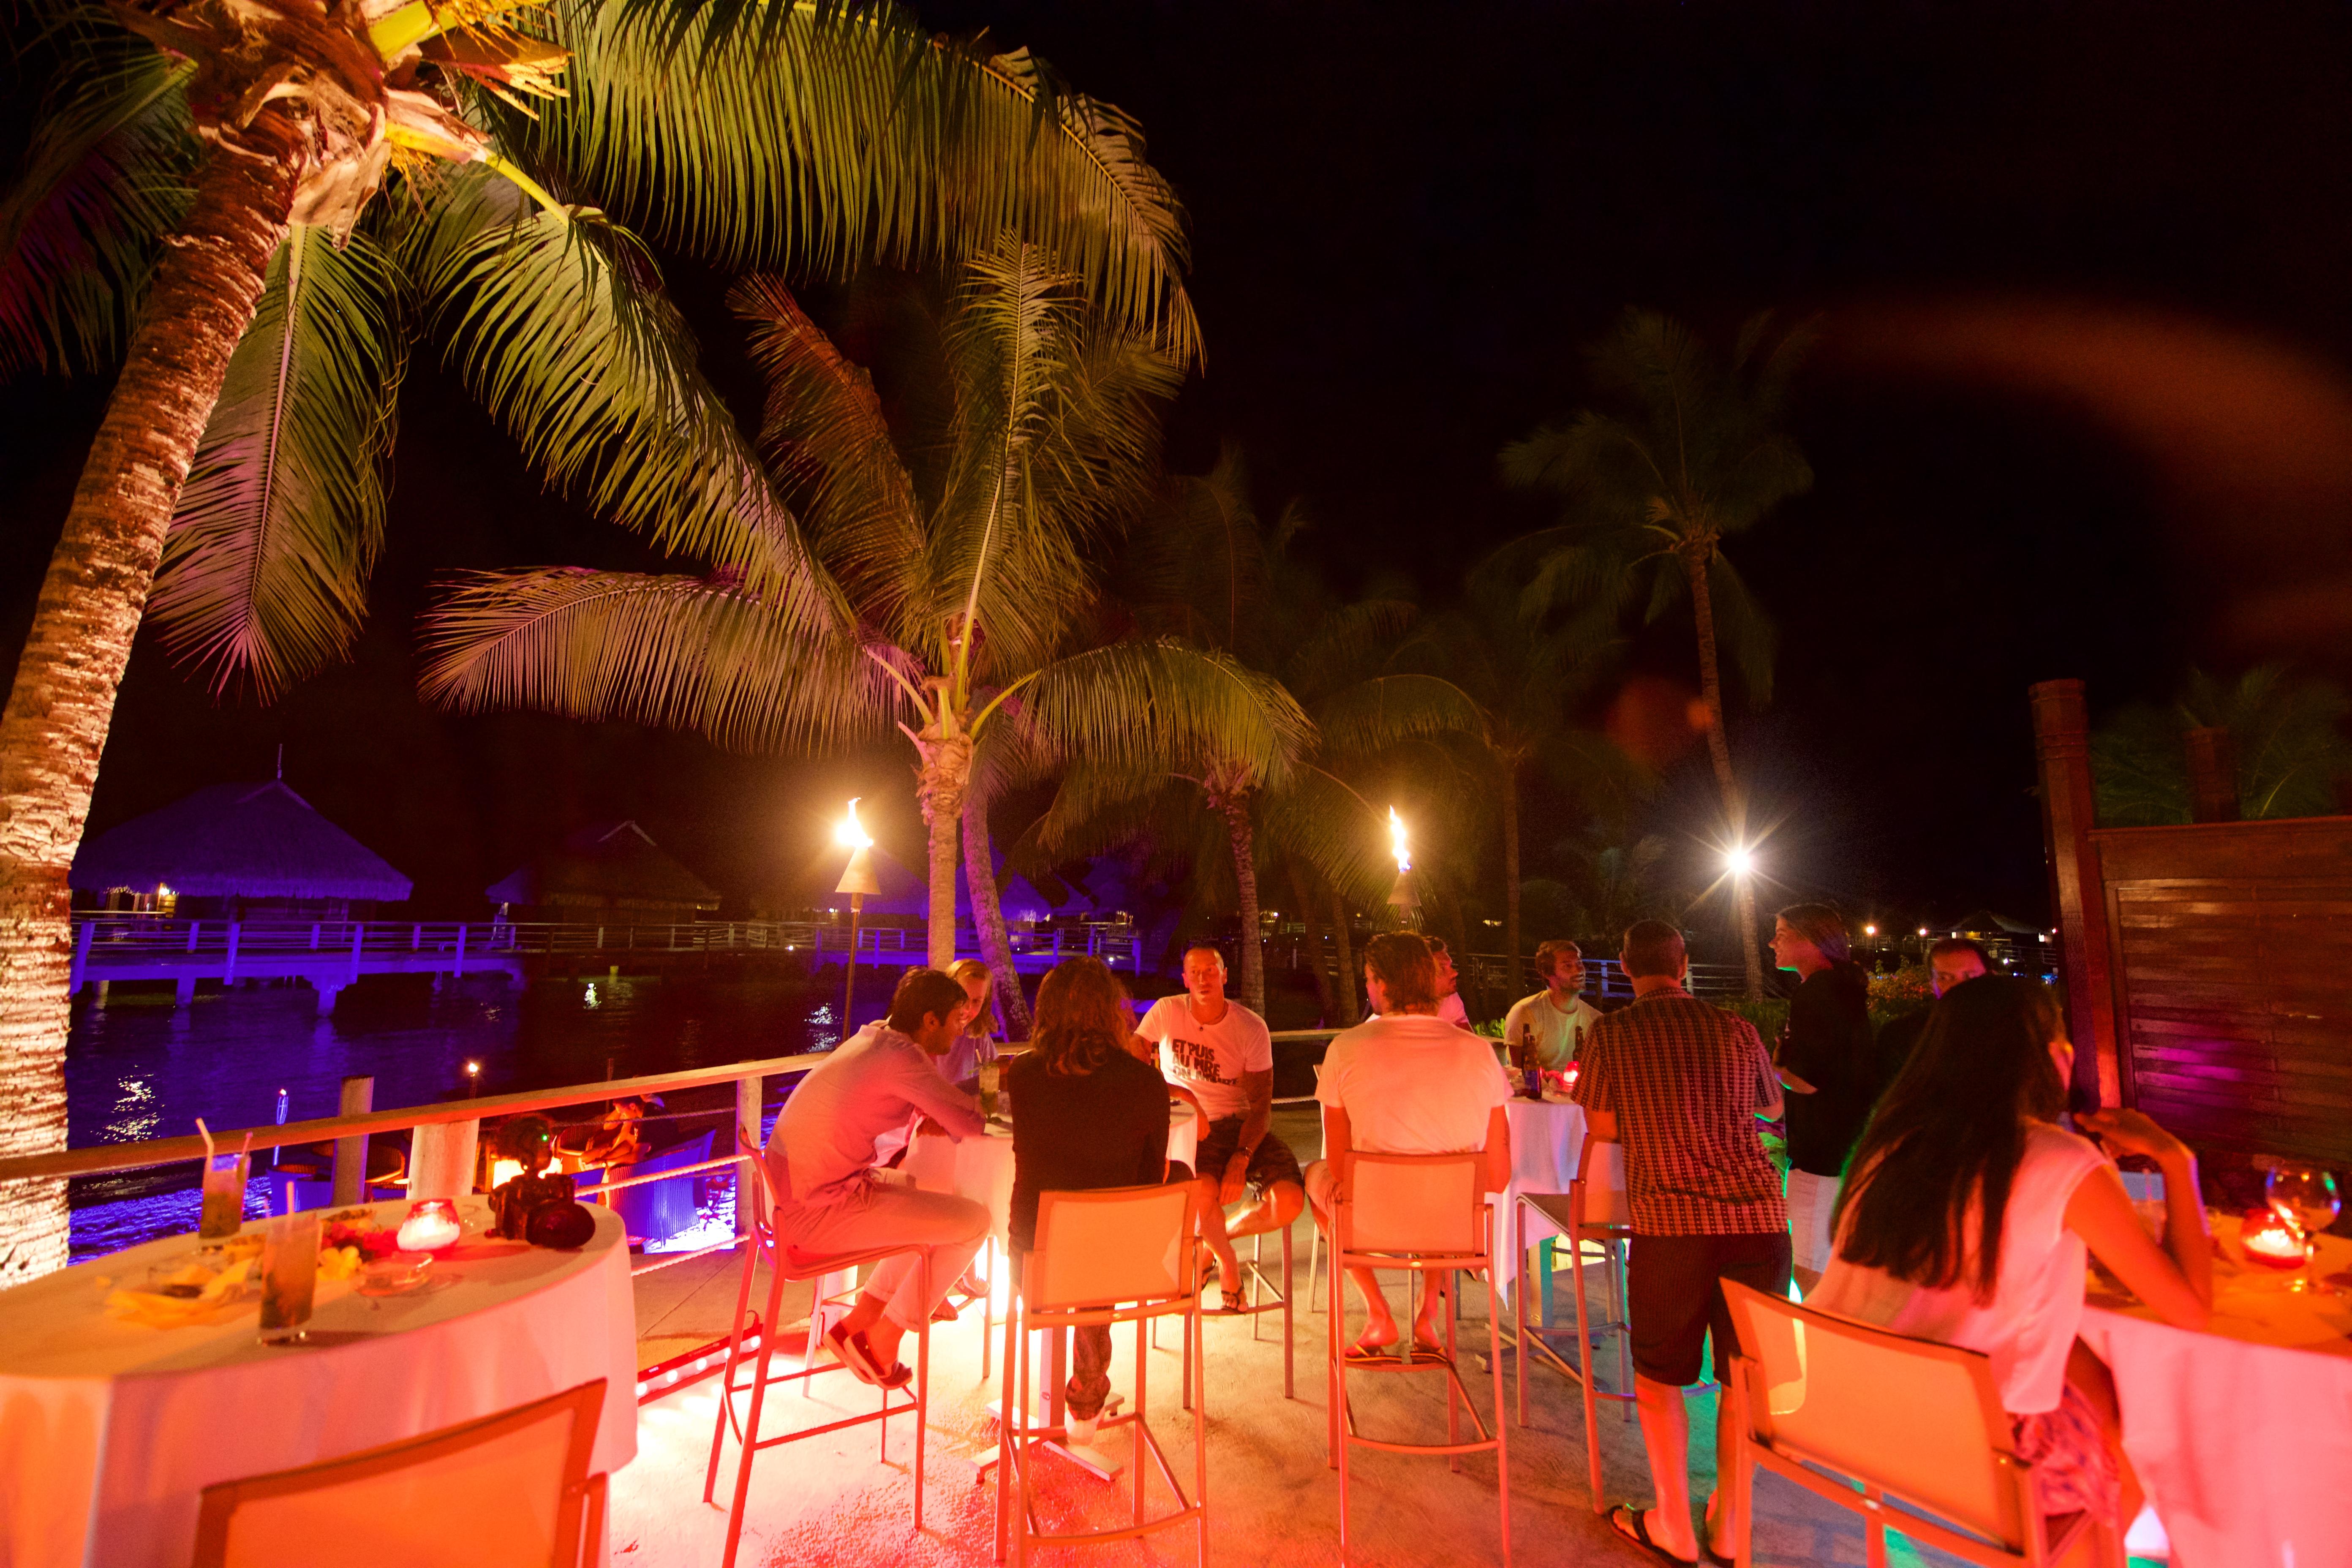 https://tahititourisme.com.au/wp-content/uploads/2018/03/RESTAURATION-Matahiehani-Lounge-Bar-featured_image-Tim_McKenna.jpg